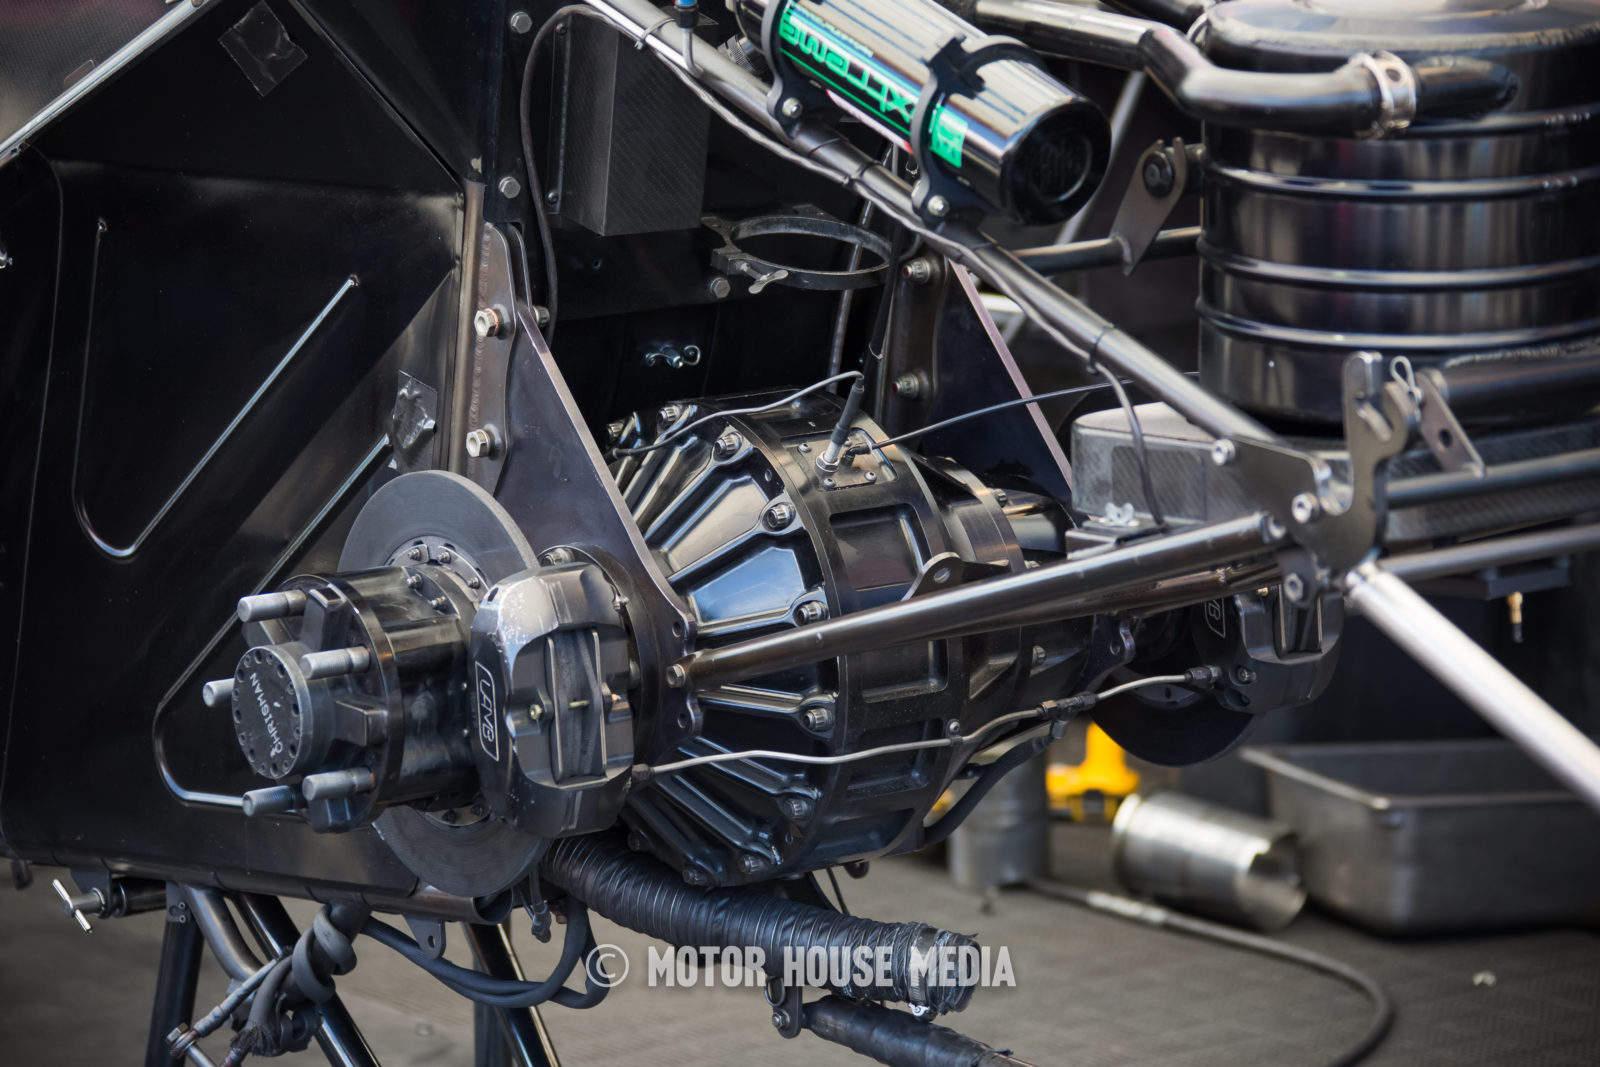 NHRA Courtney Force's Funnycar rear teardown between rounds